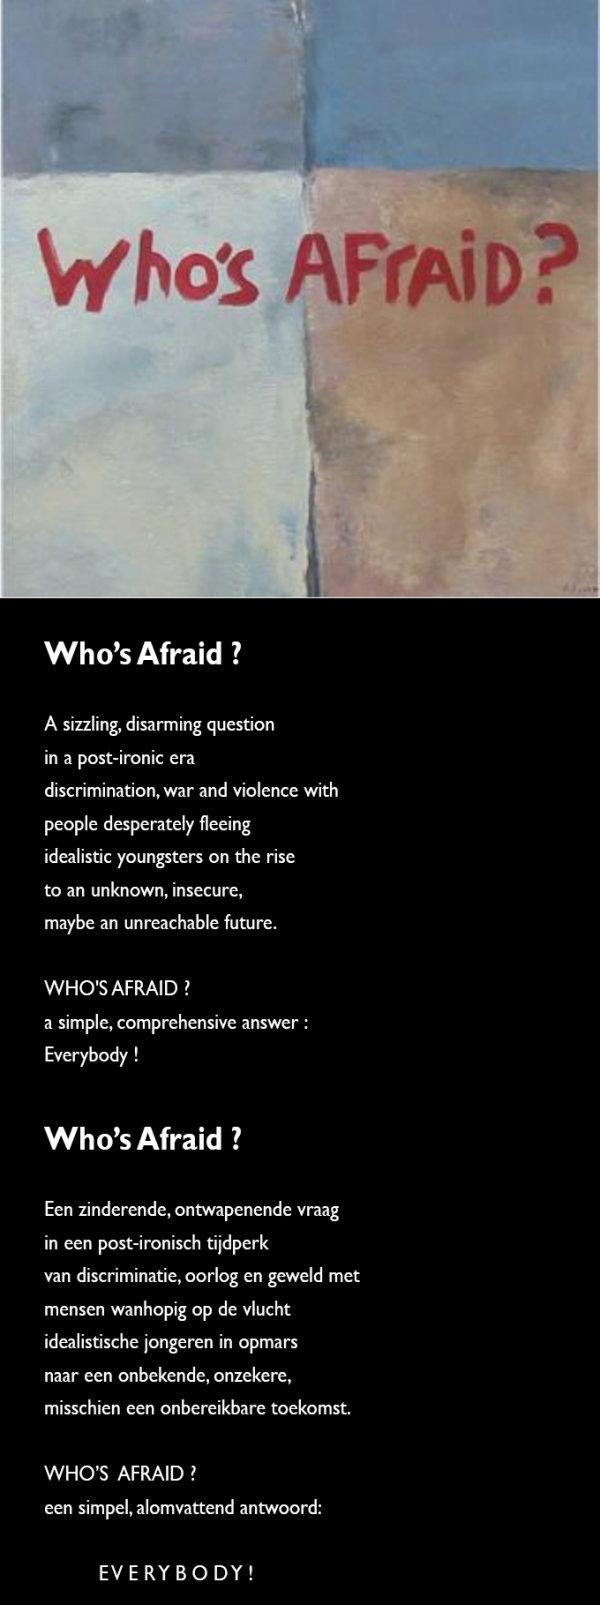 Who's Afraid - by Alida Lyssens (Belgium)